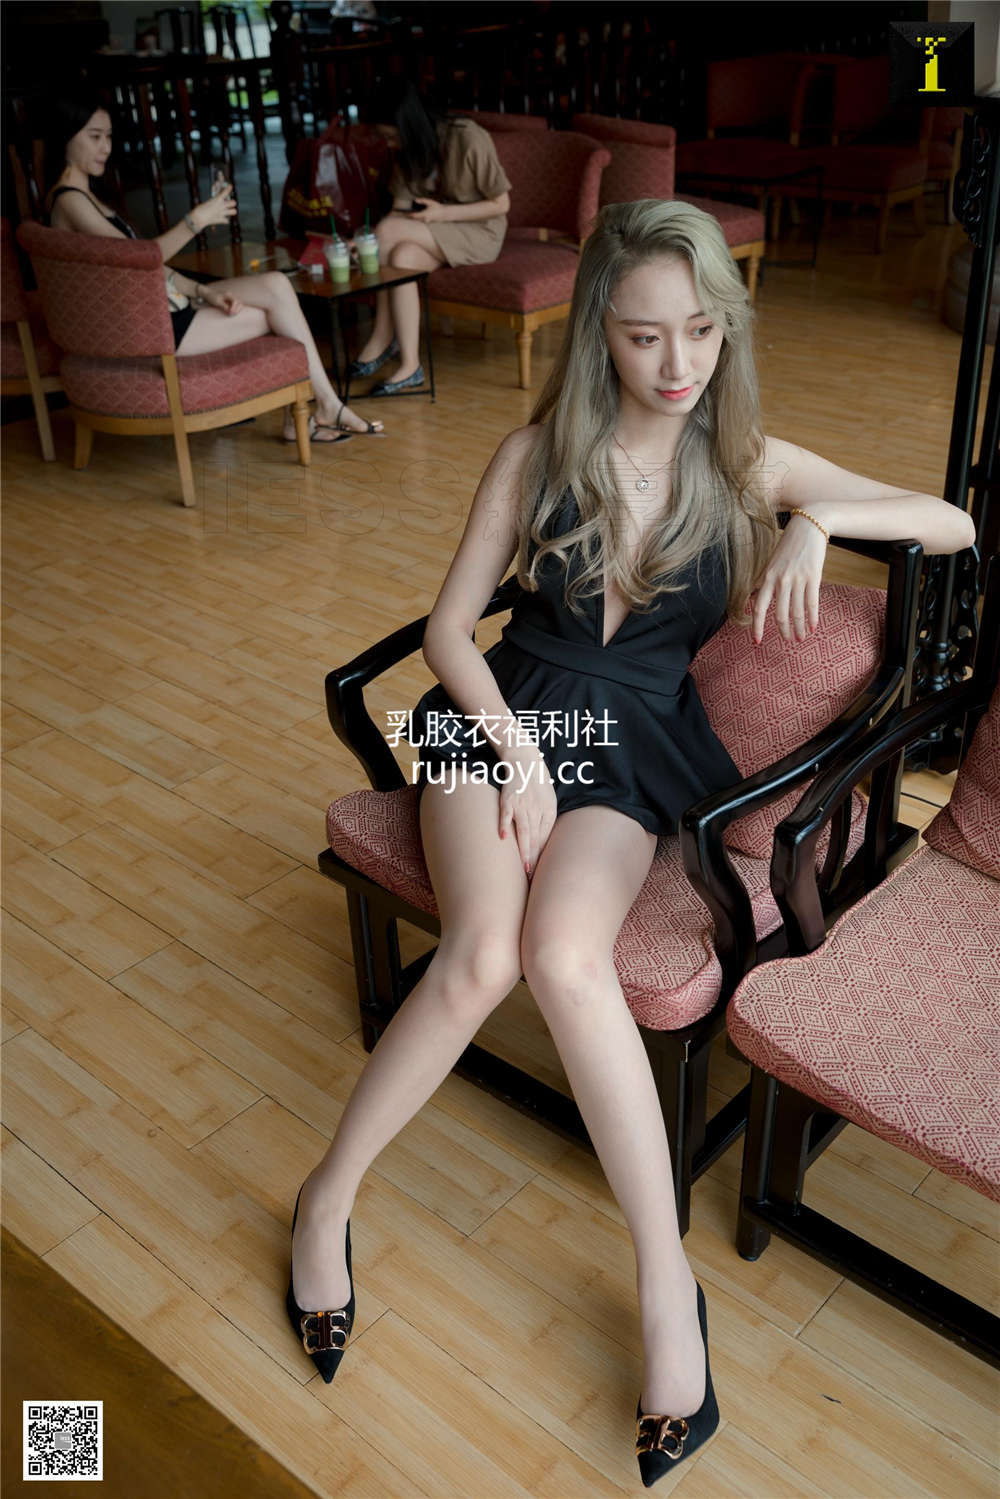 [IESS异思趣向] 丝享家 NO.496-500 5期打包合集黑丝袜美腿高清百度云下载